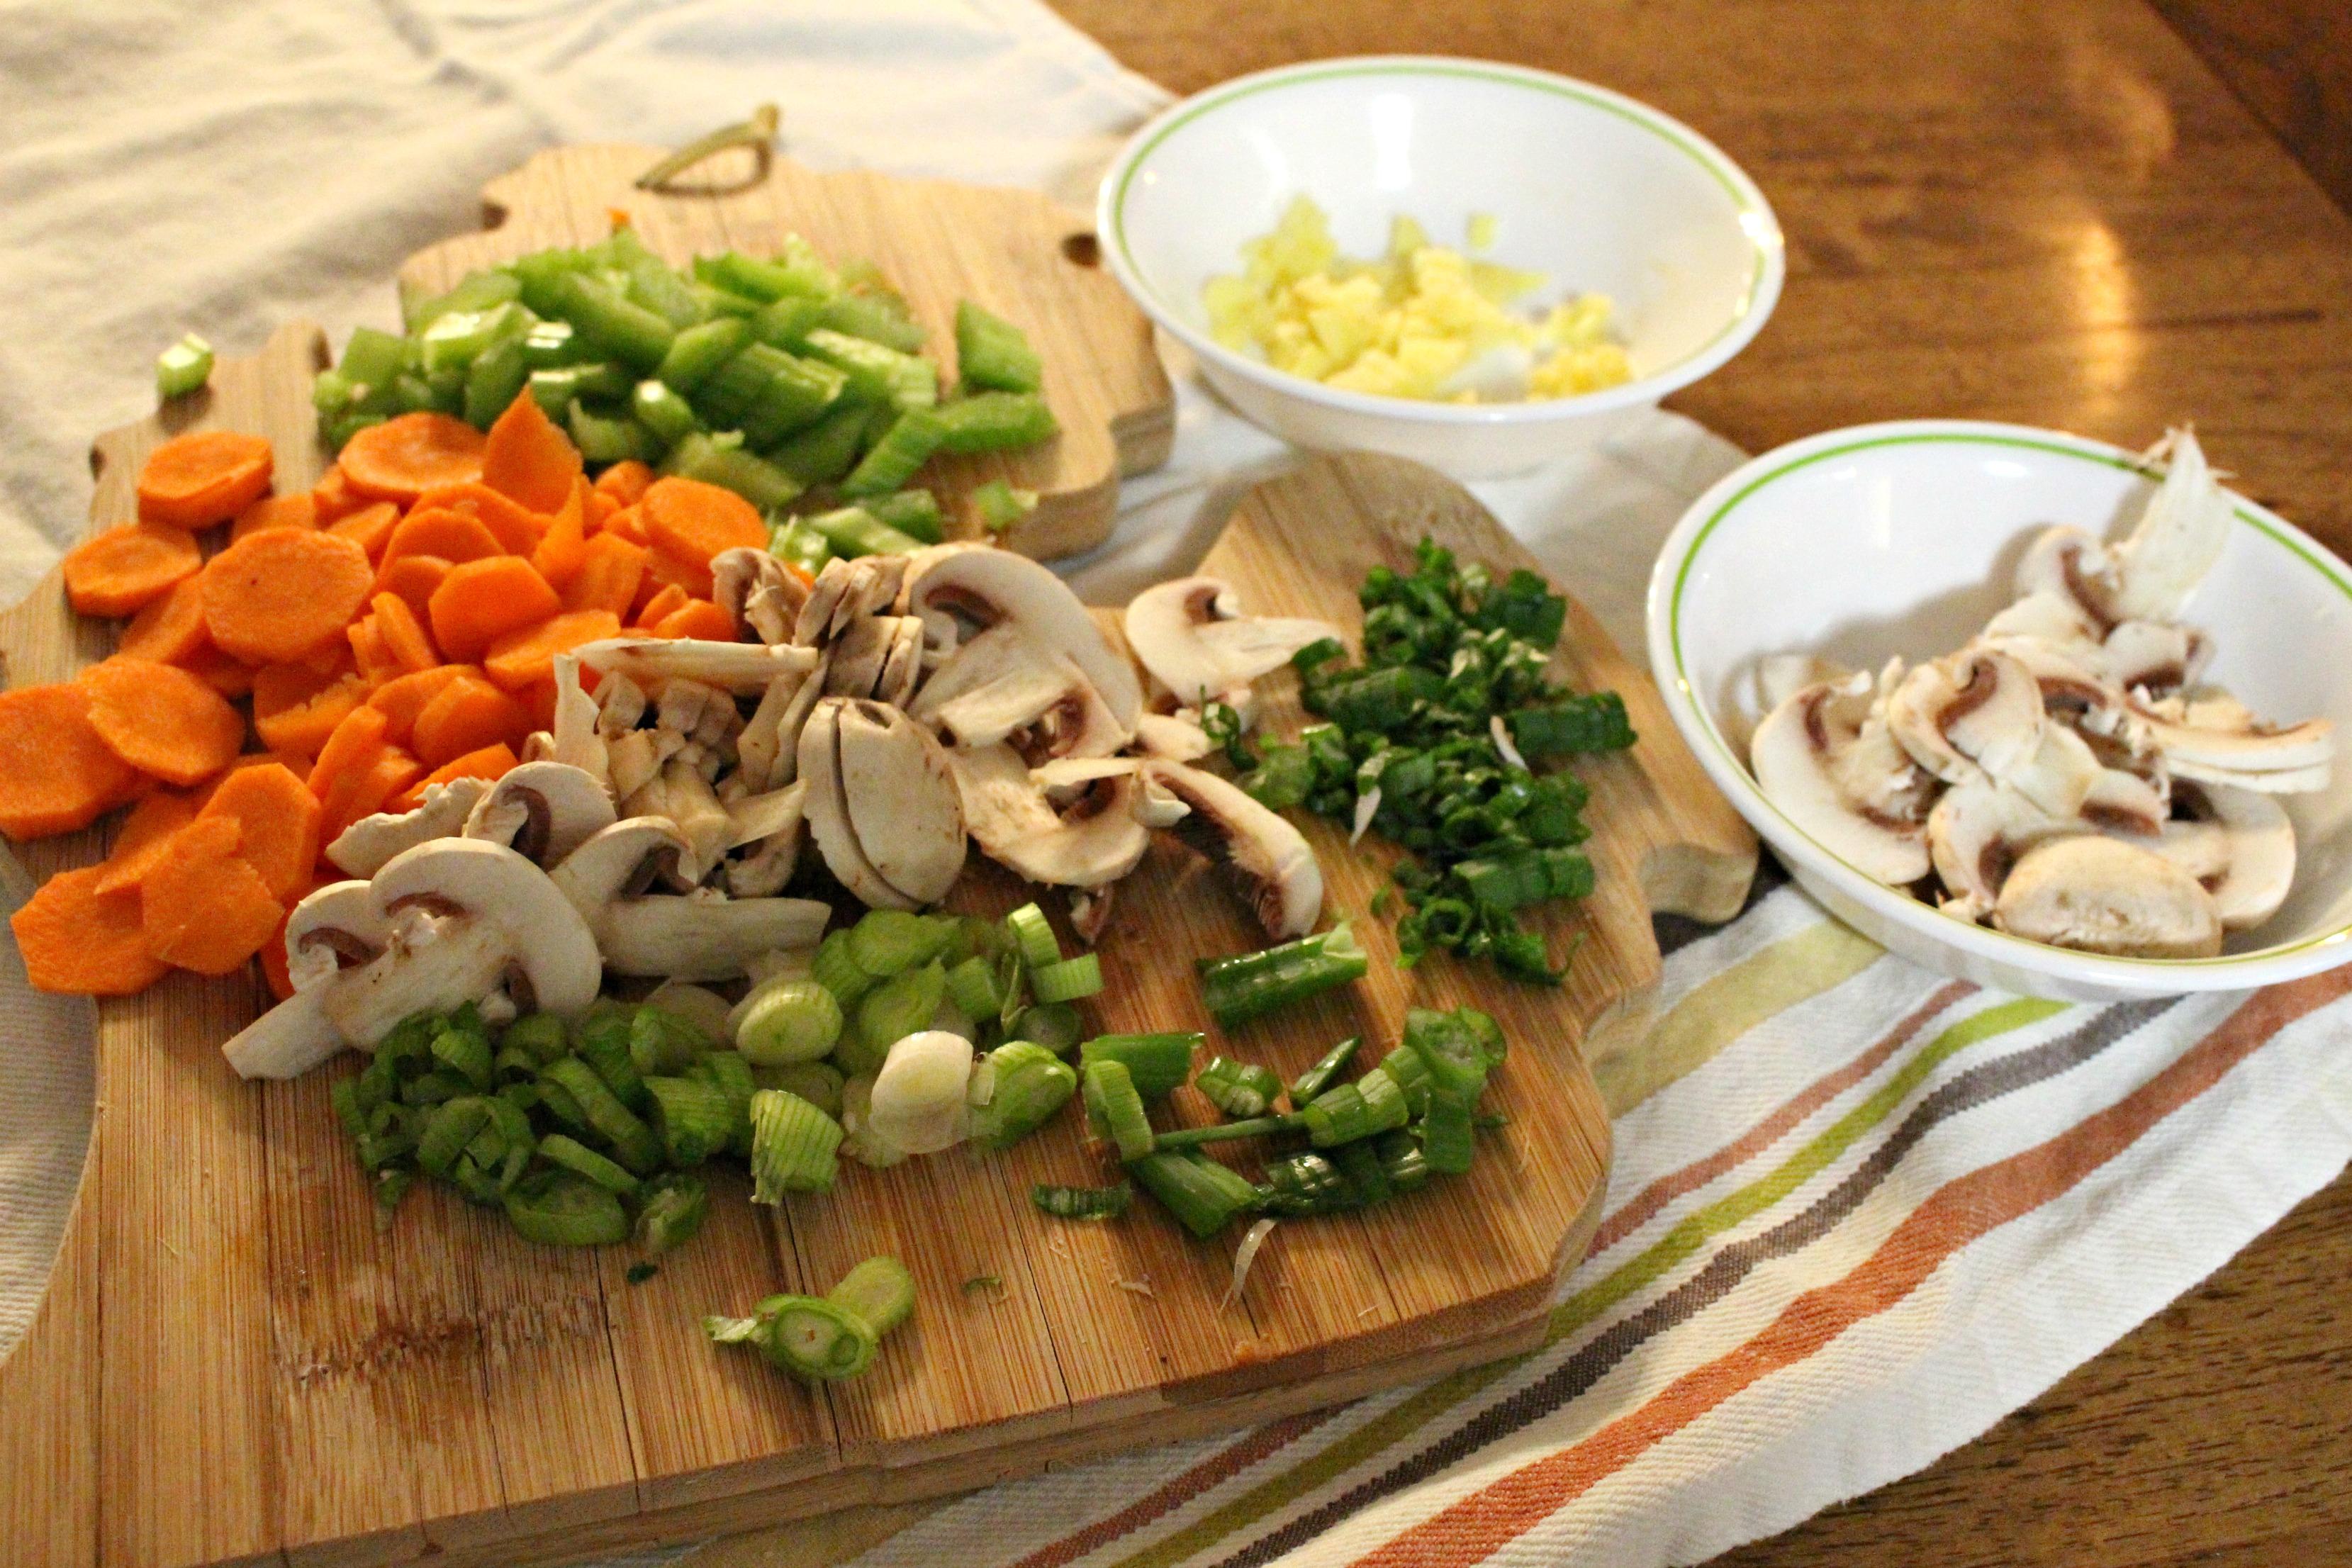 Blue apron udon noodles - Blue Apron Udon Noodles 64